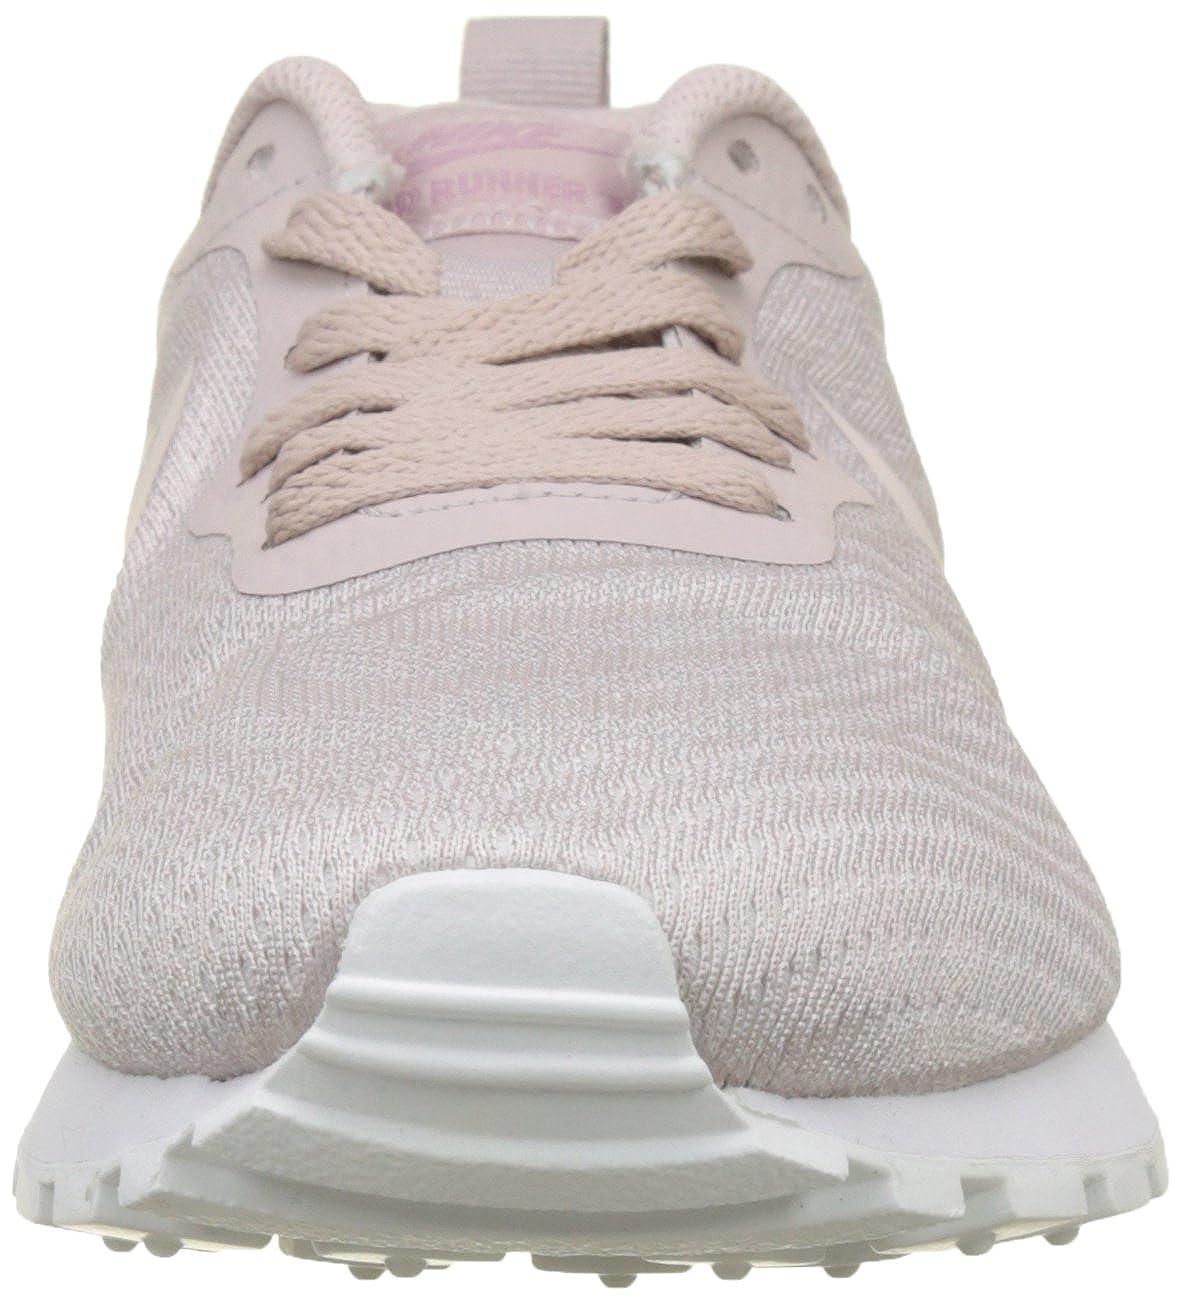 c6f853908fdb4 NIKE Women s WMNS Md Runner 2 Eng Mesh Gymnastics Shoes  Amazon.co.uk  Shoes    Bags